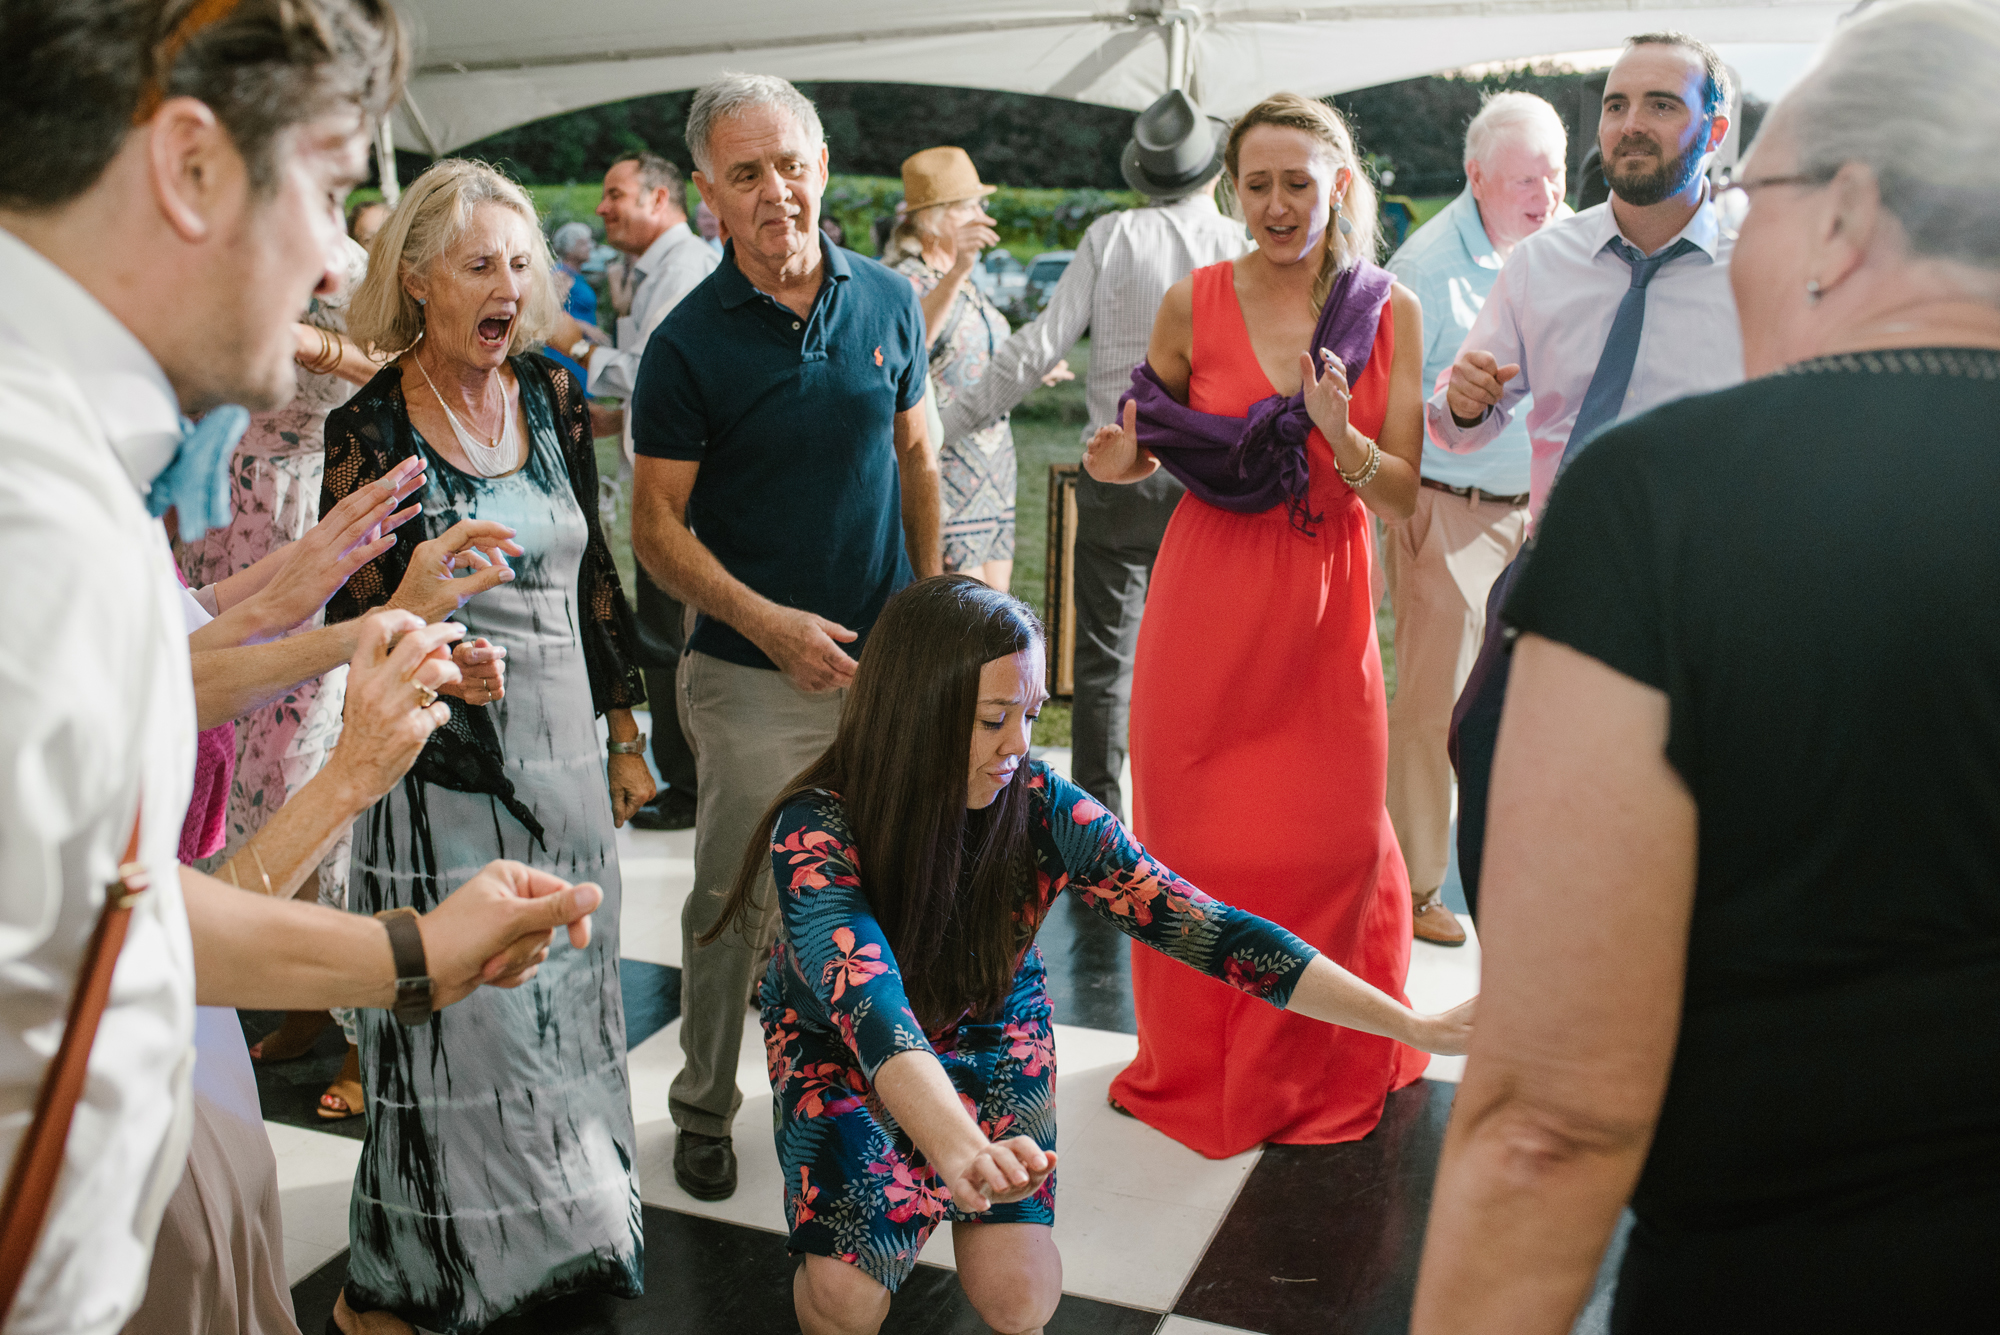 Quincy-Coldwater-Michigan-farm-wedding-photogapher-sydney-marie (516).jpg